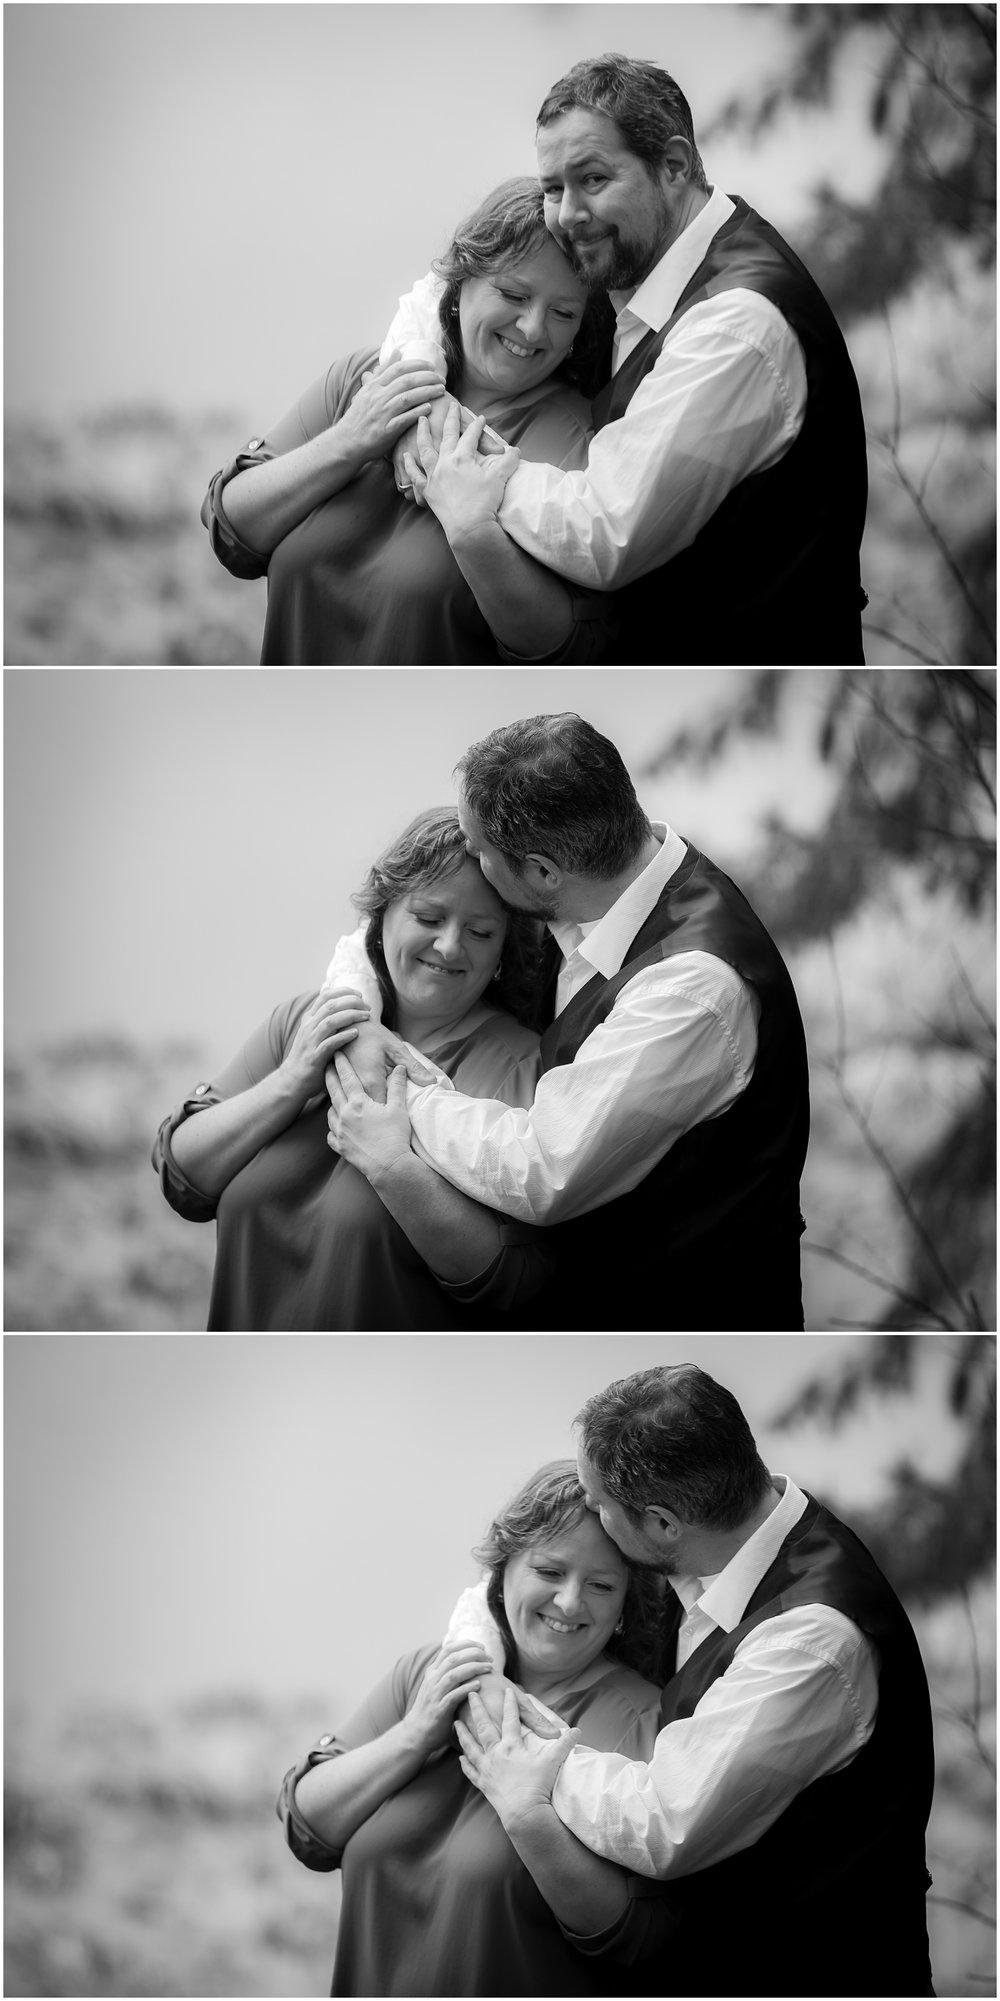 Amazing Day Photography - Minnekhada Engagment Session - Langley Engagement Photographer - Langley Wedding Photographer - Coquitlam Engagement Session (3).jpg